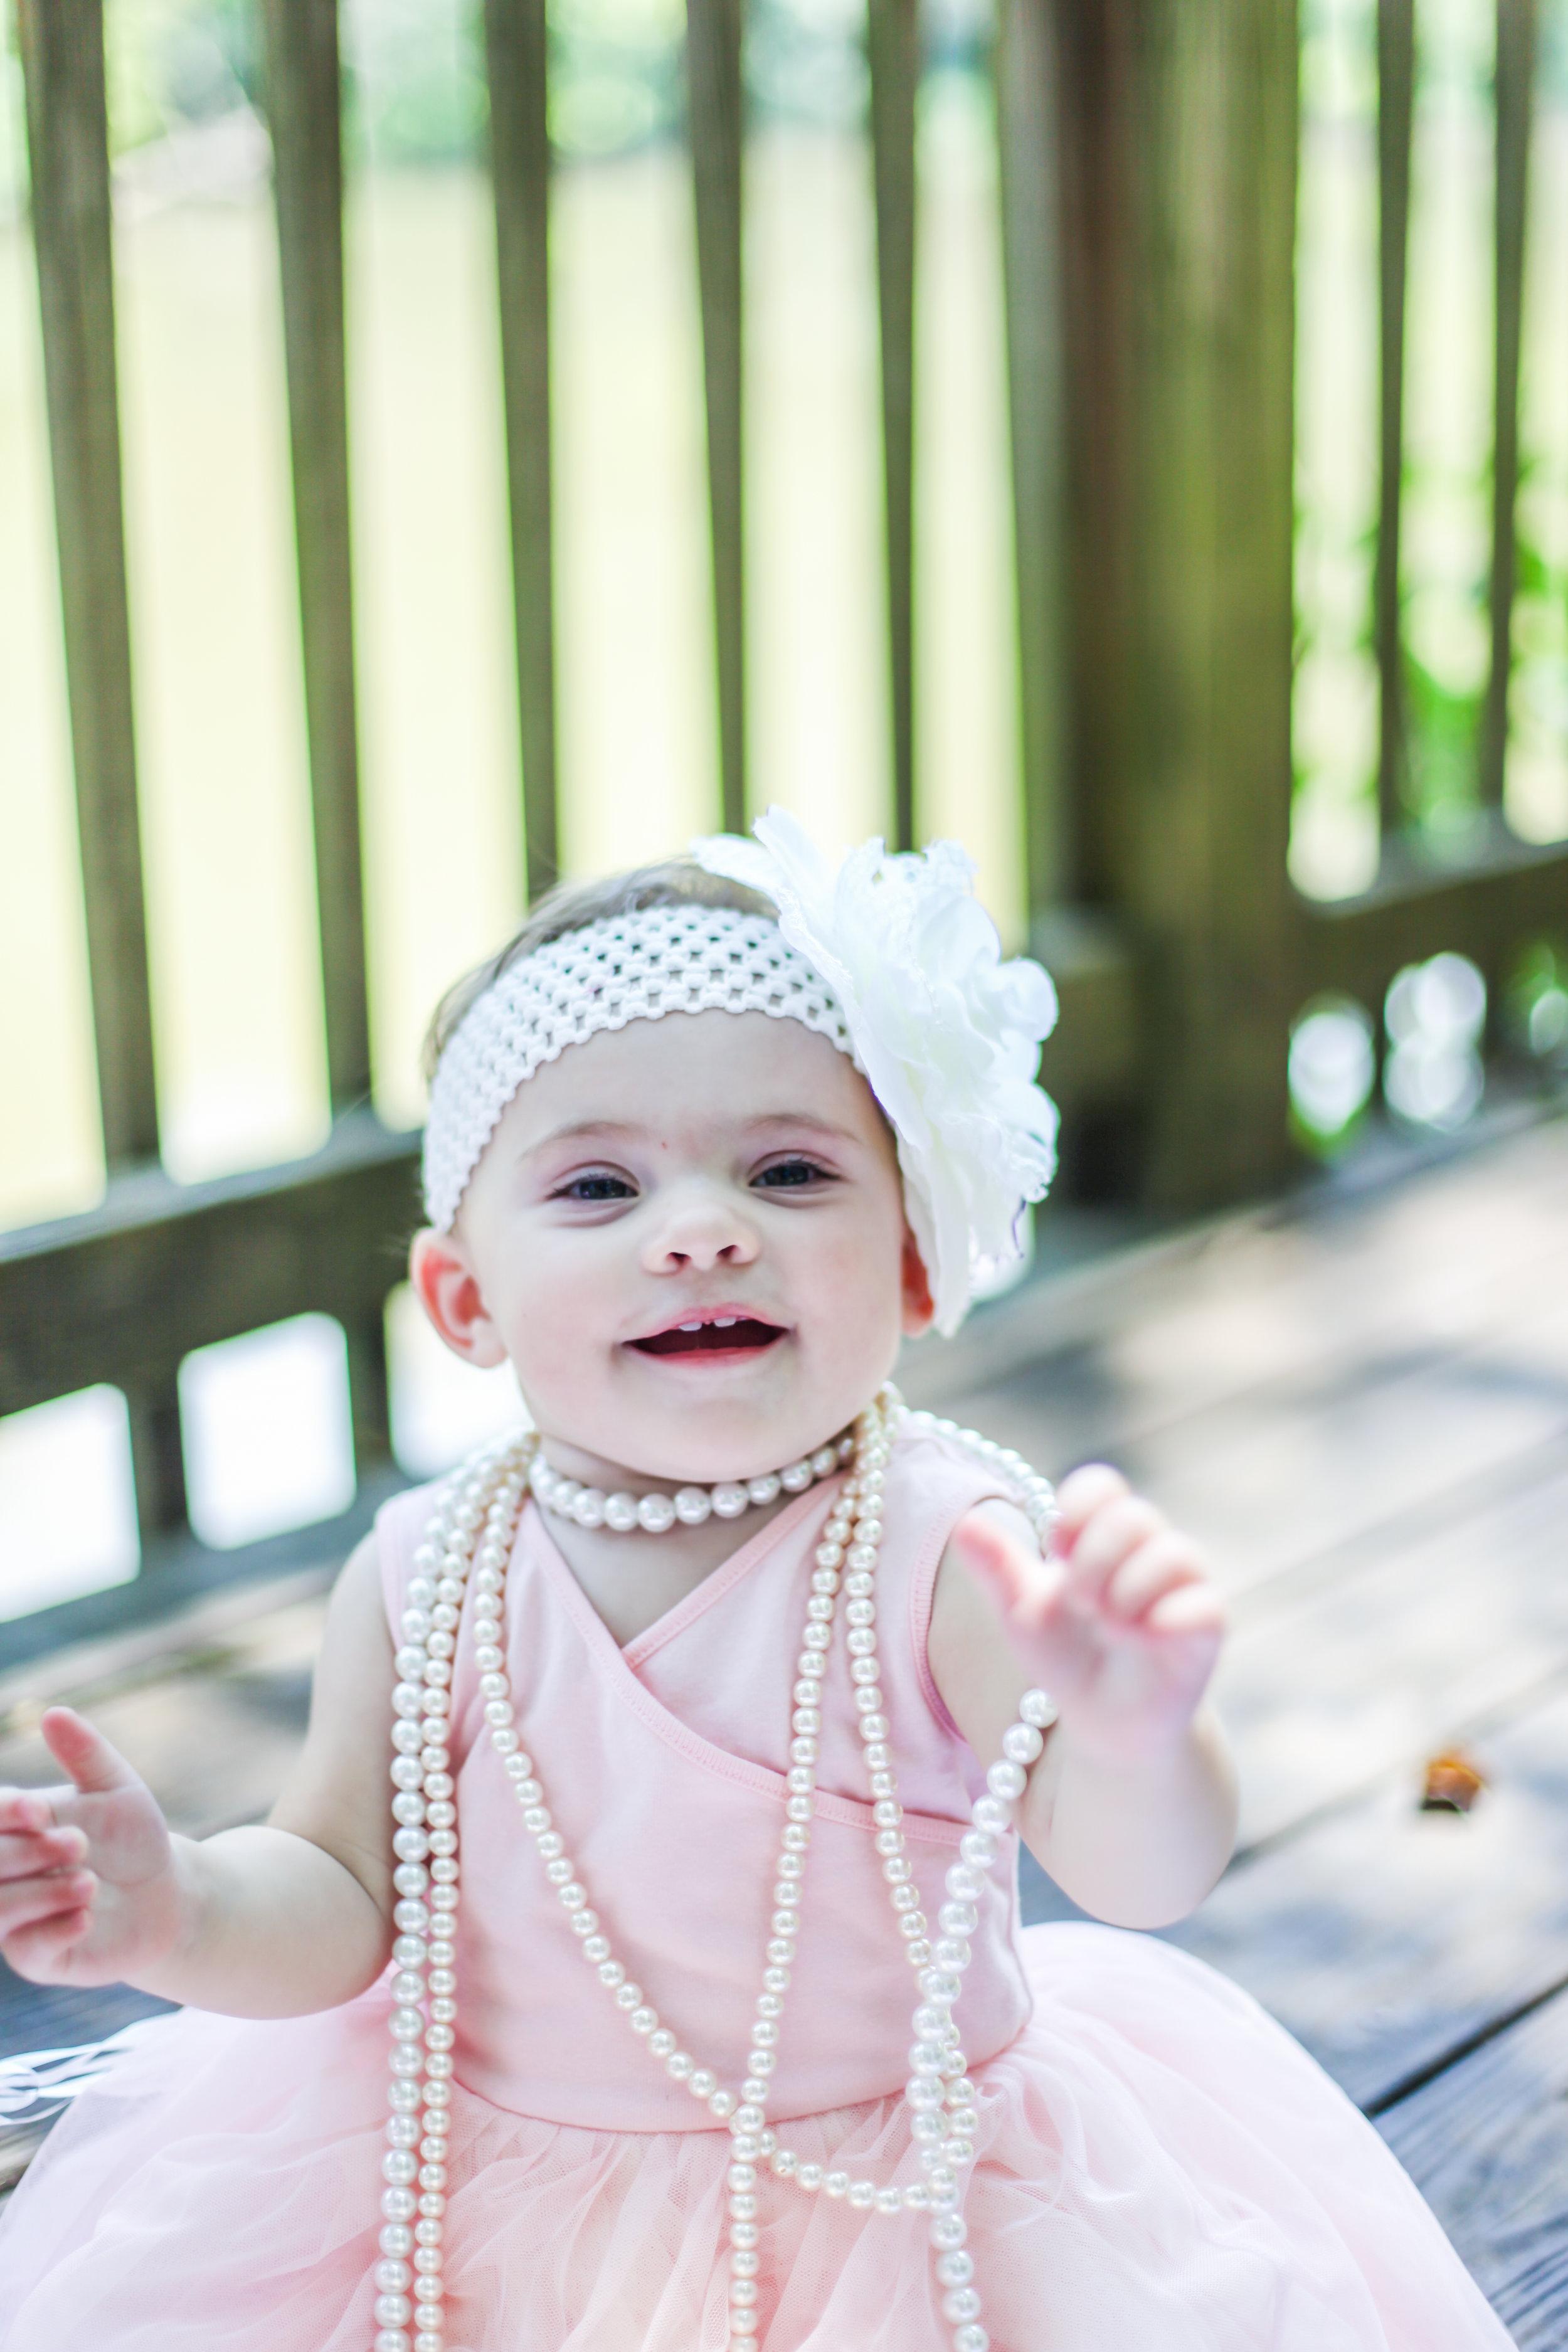 woodstock baby photography angela elliott-39.jpg